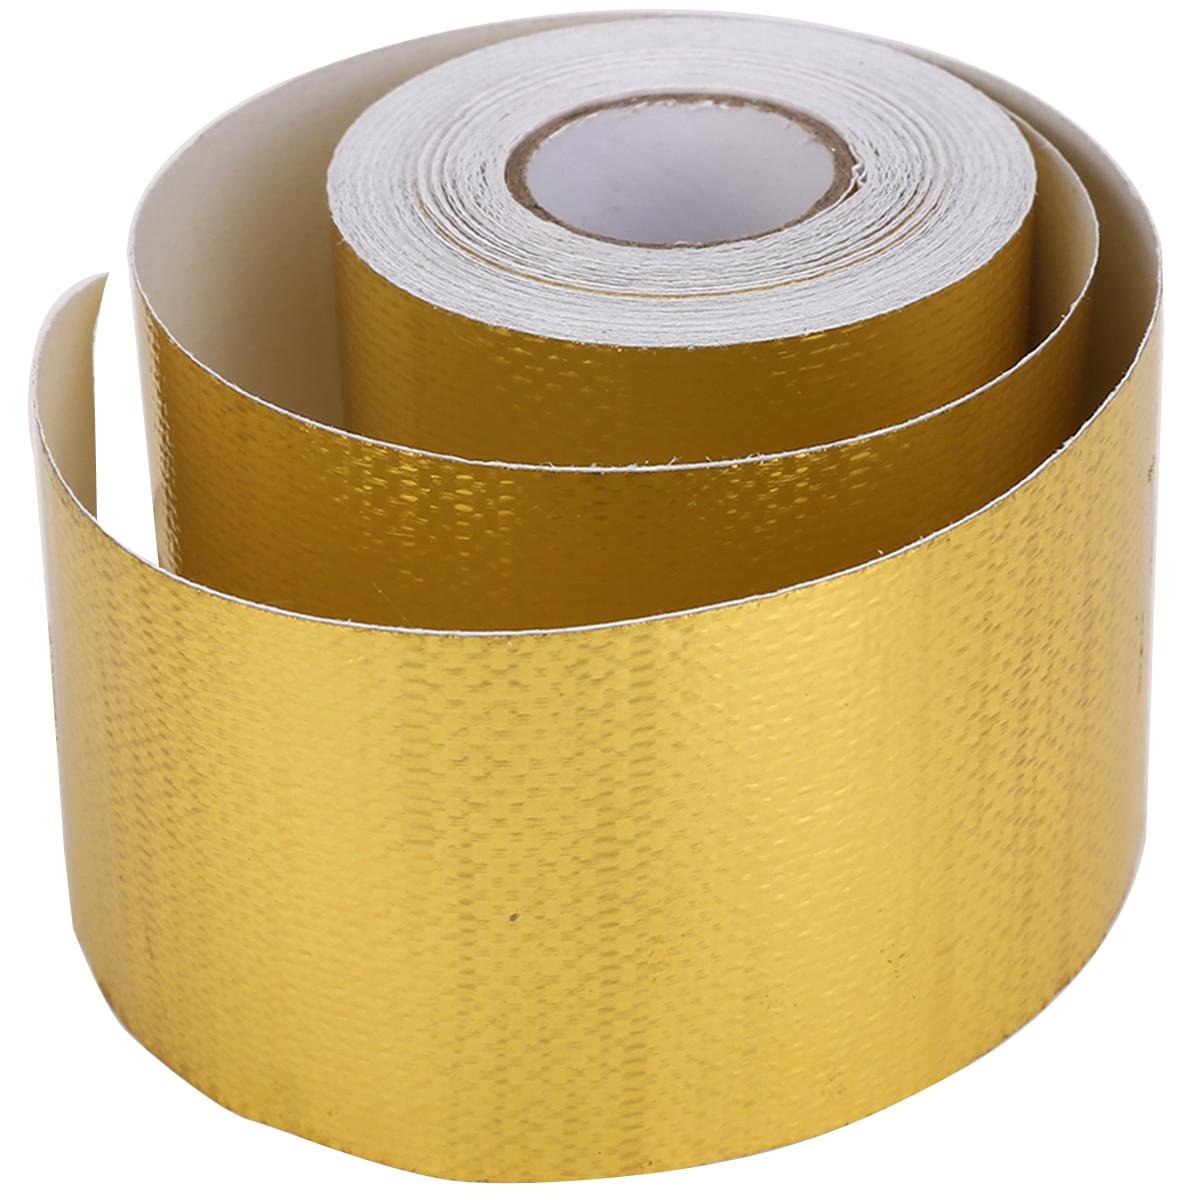 1 Roll 5CM*9M Self-Adhesive Heat Reflective Tape Car Truck Motorcycle Fiberglass Heat Shields Reflect Adhesive Wrap Barrier Roll